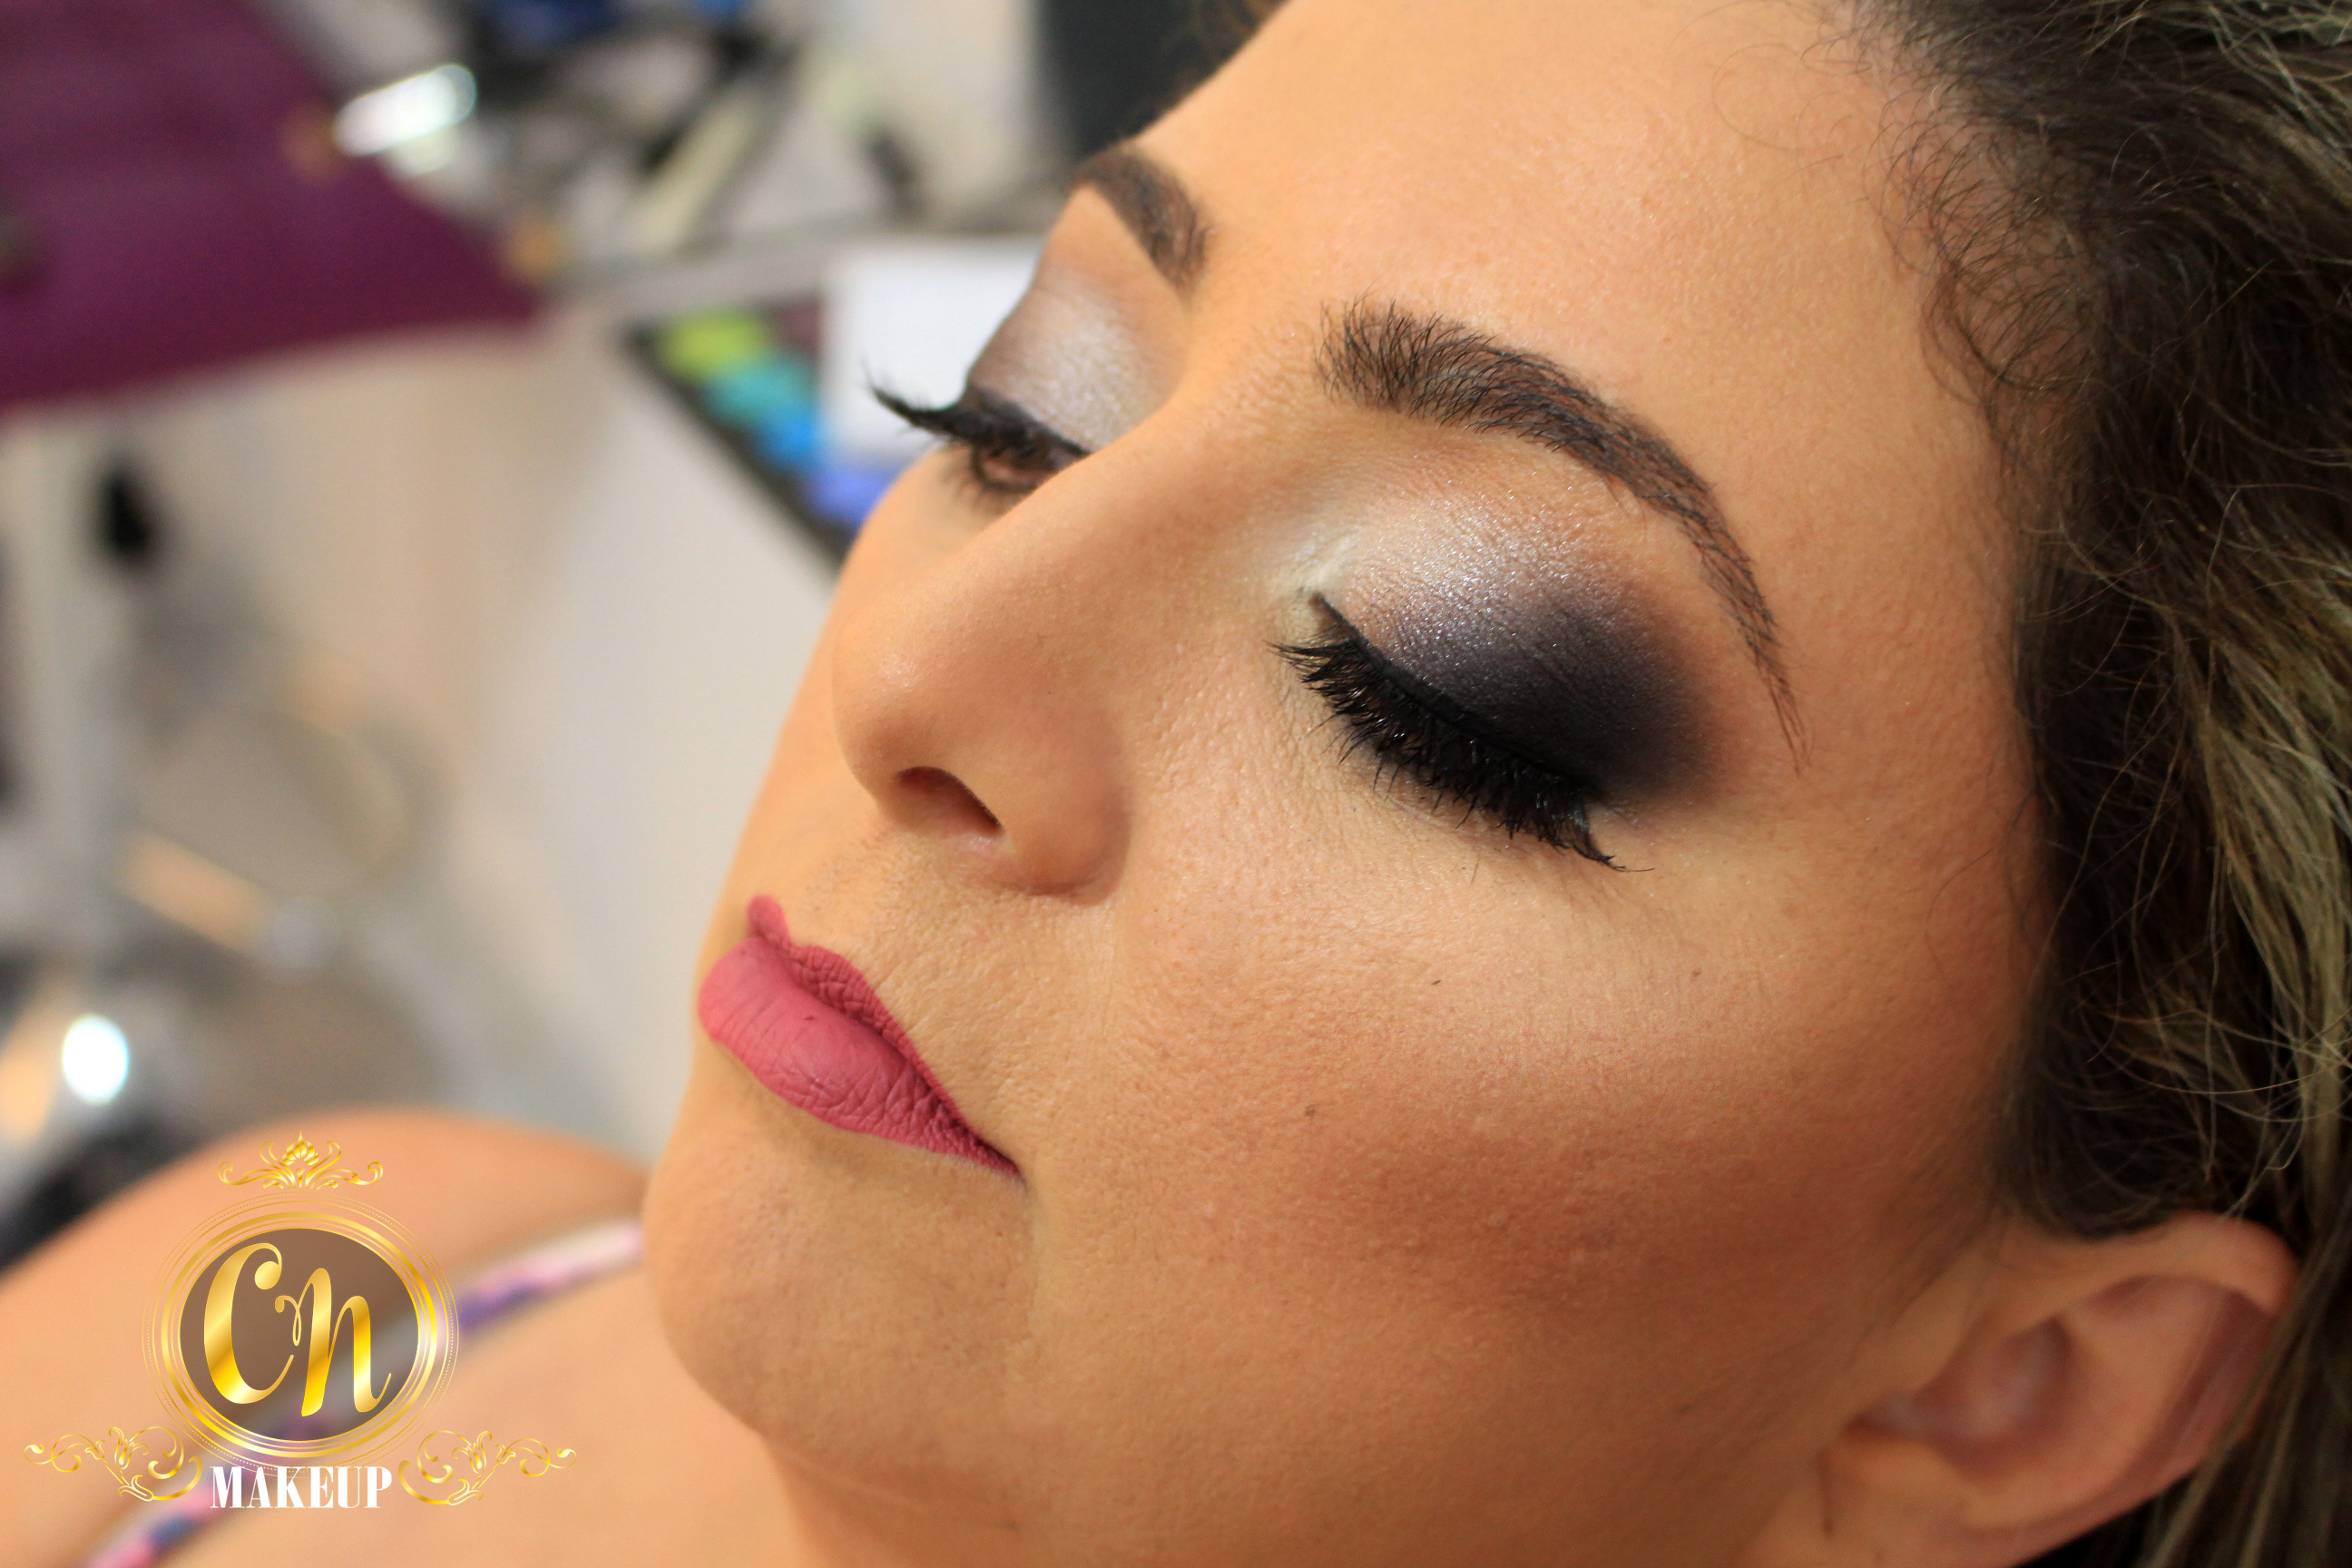 Maquiagem poderosa para convidada de aniversário!  #maquiadoraubatuba #maquiagempoderosa #maquiagemubatuba #convidada #aniversario #casamento #eventos maquiagem maquiador(a)